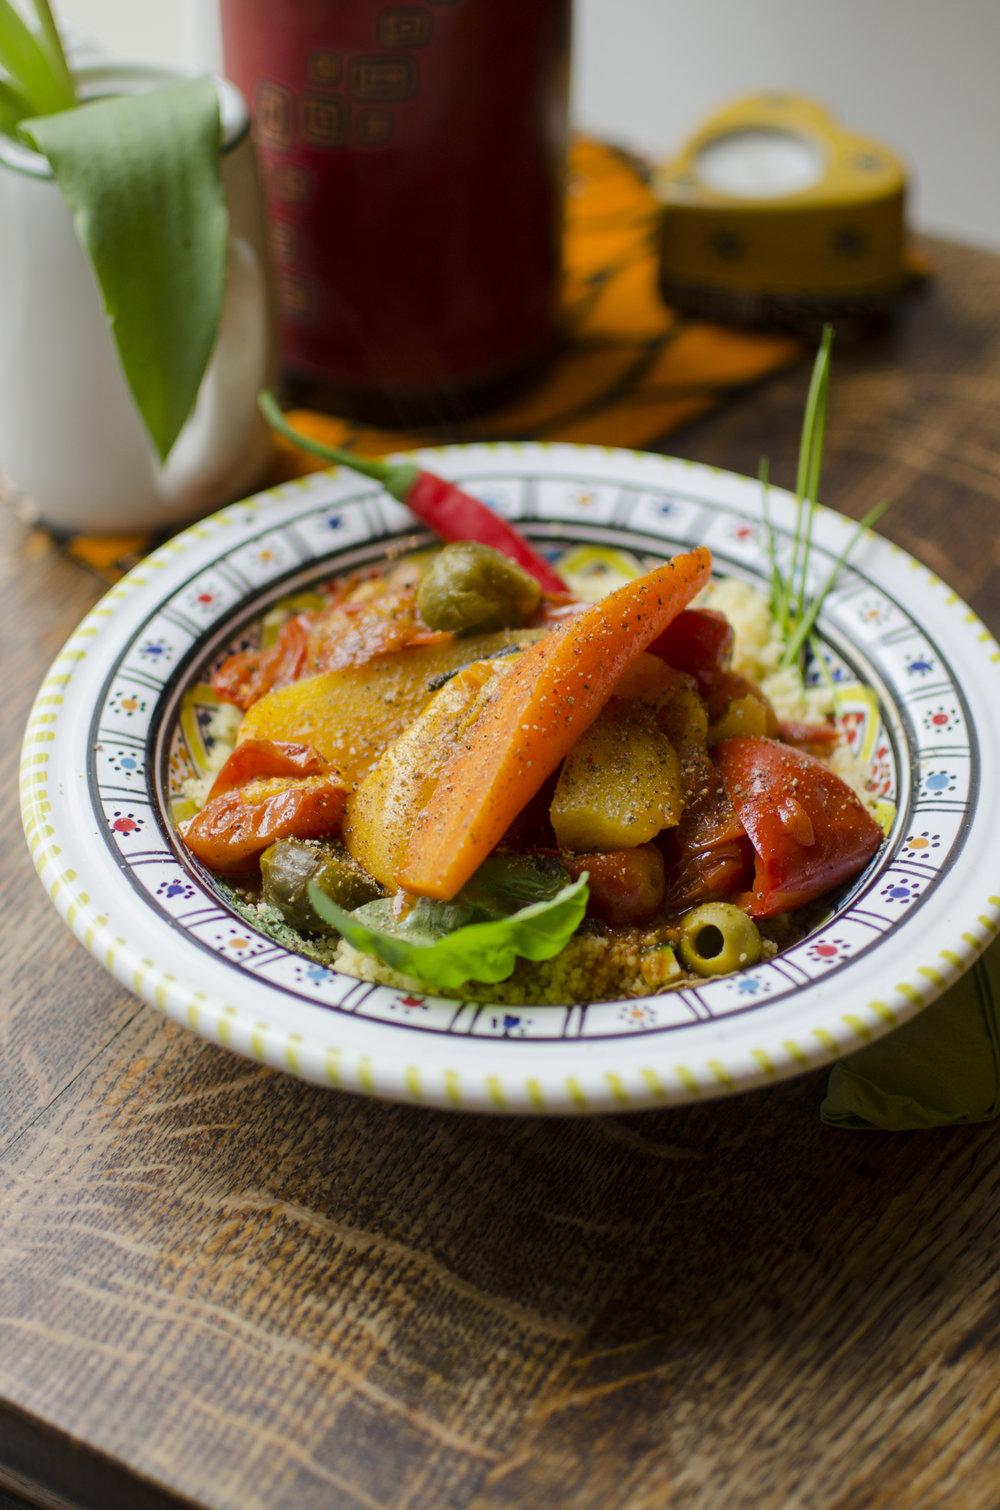 heycater-catering-service-berlin-atayacaffe-couscous-2 (1).jpeg